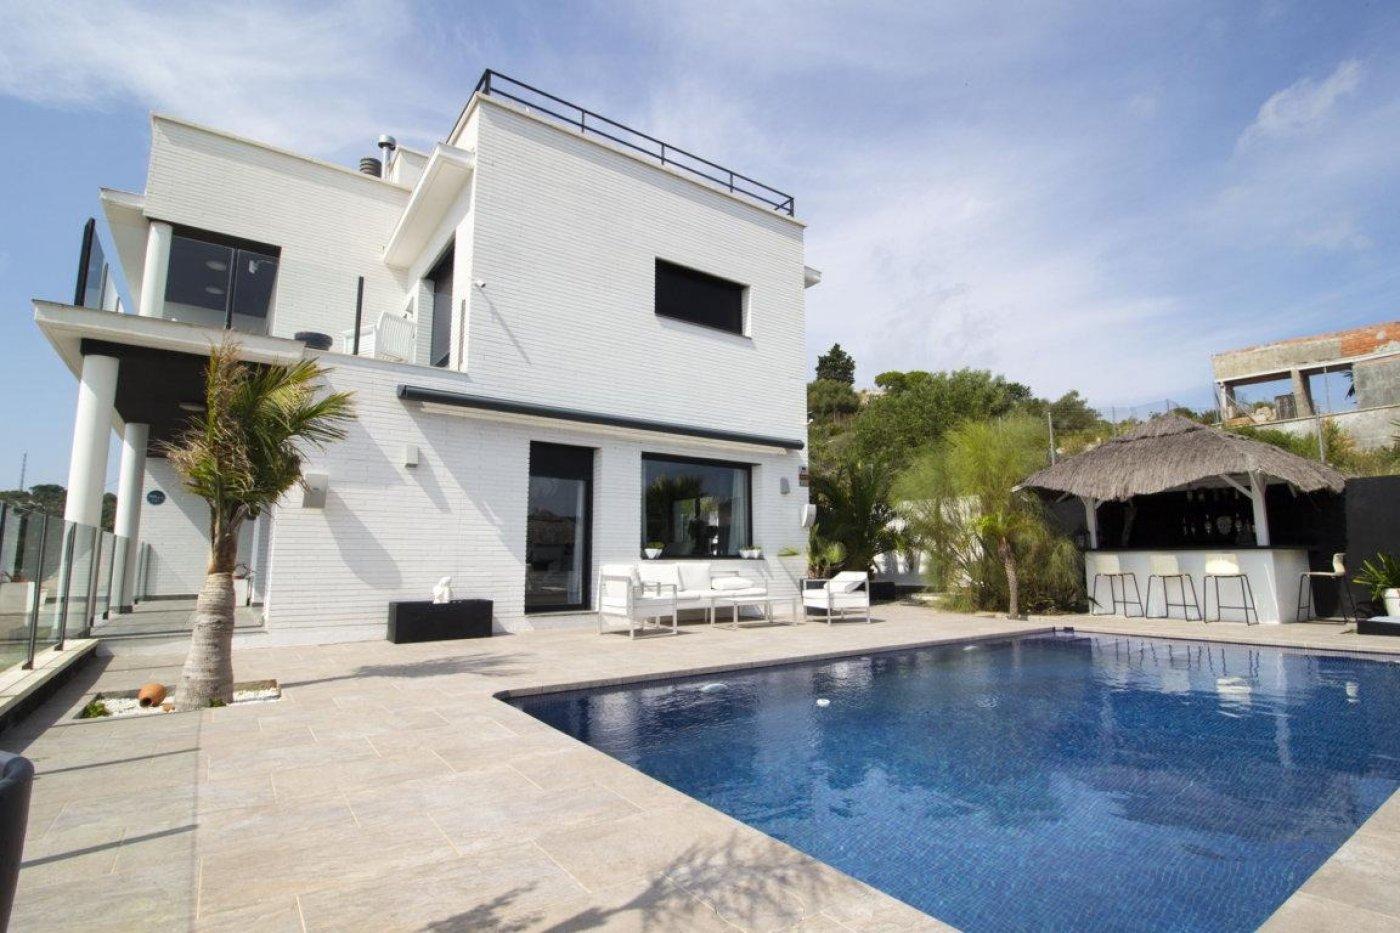 Casa exclusiva con piscina - imagenInmueble7